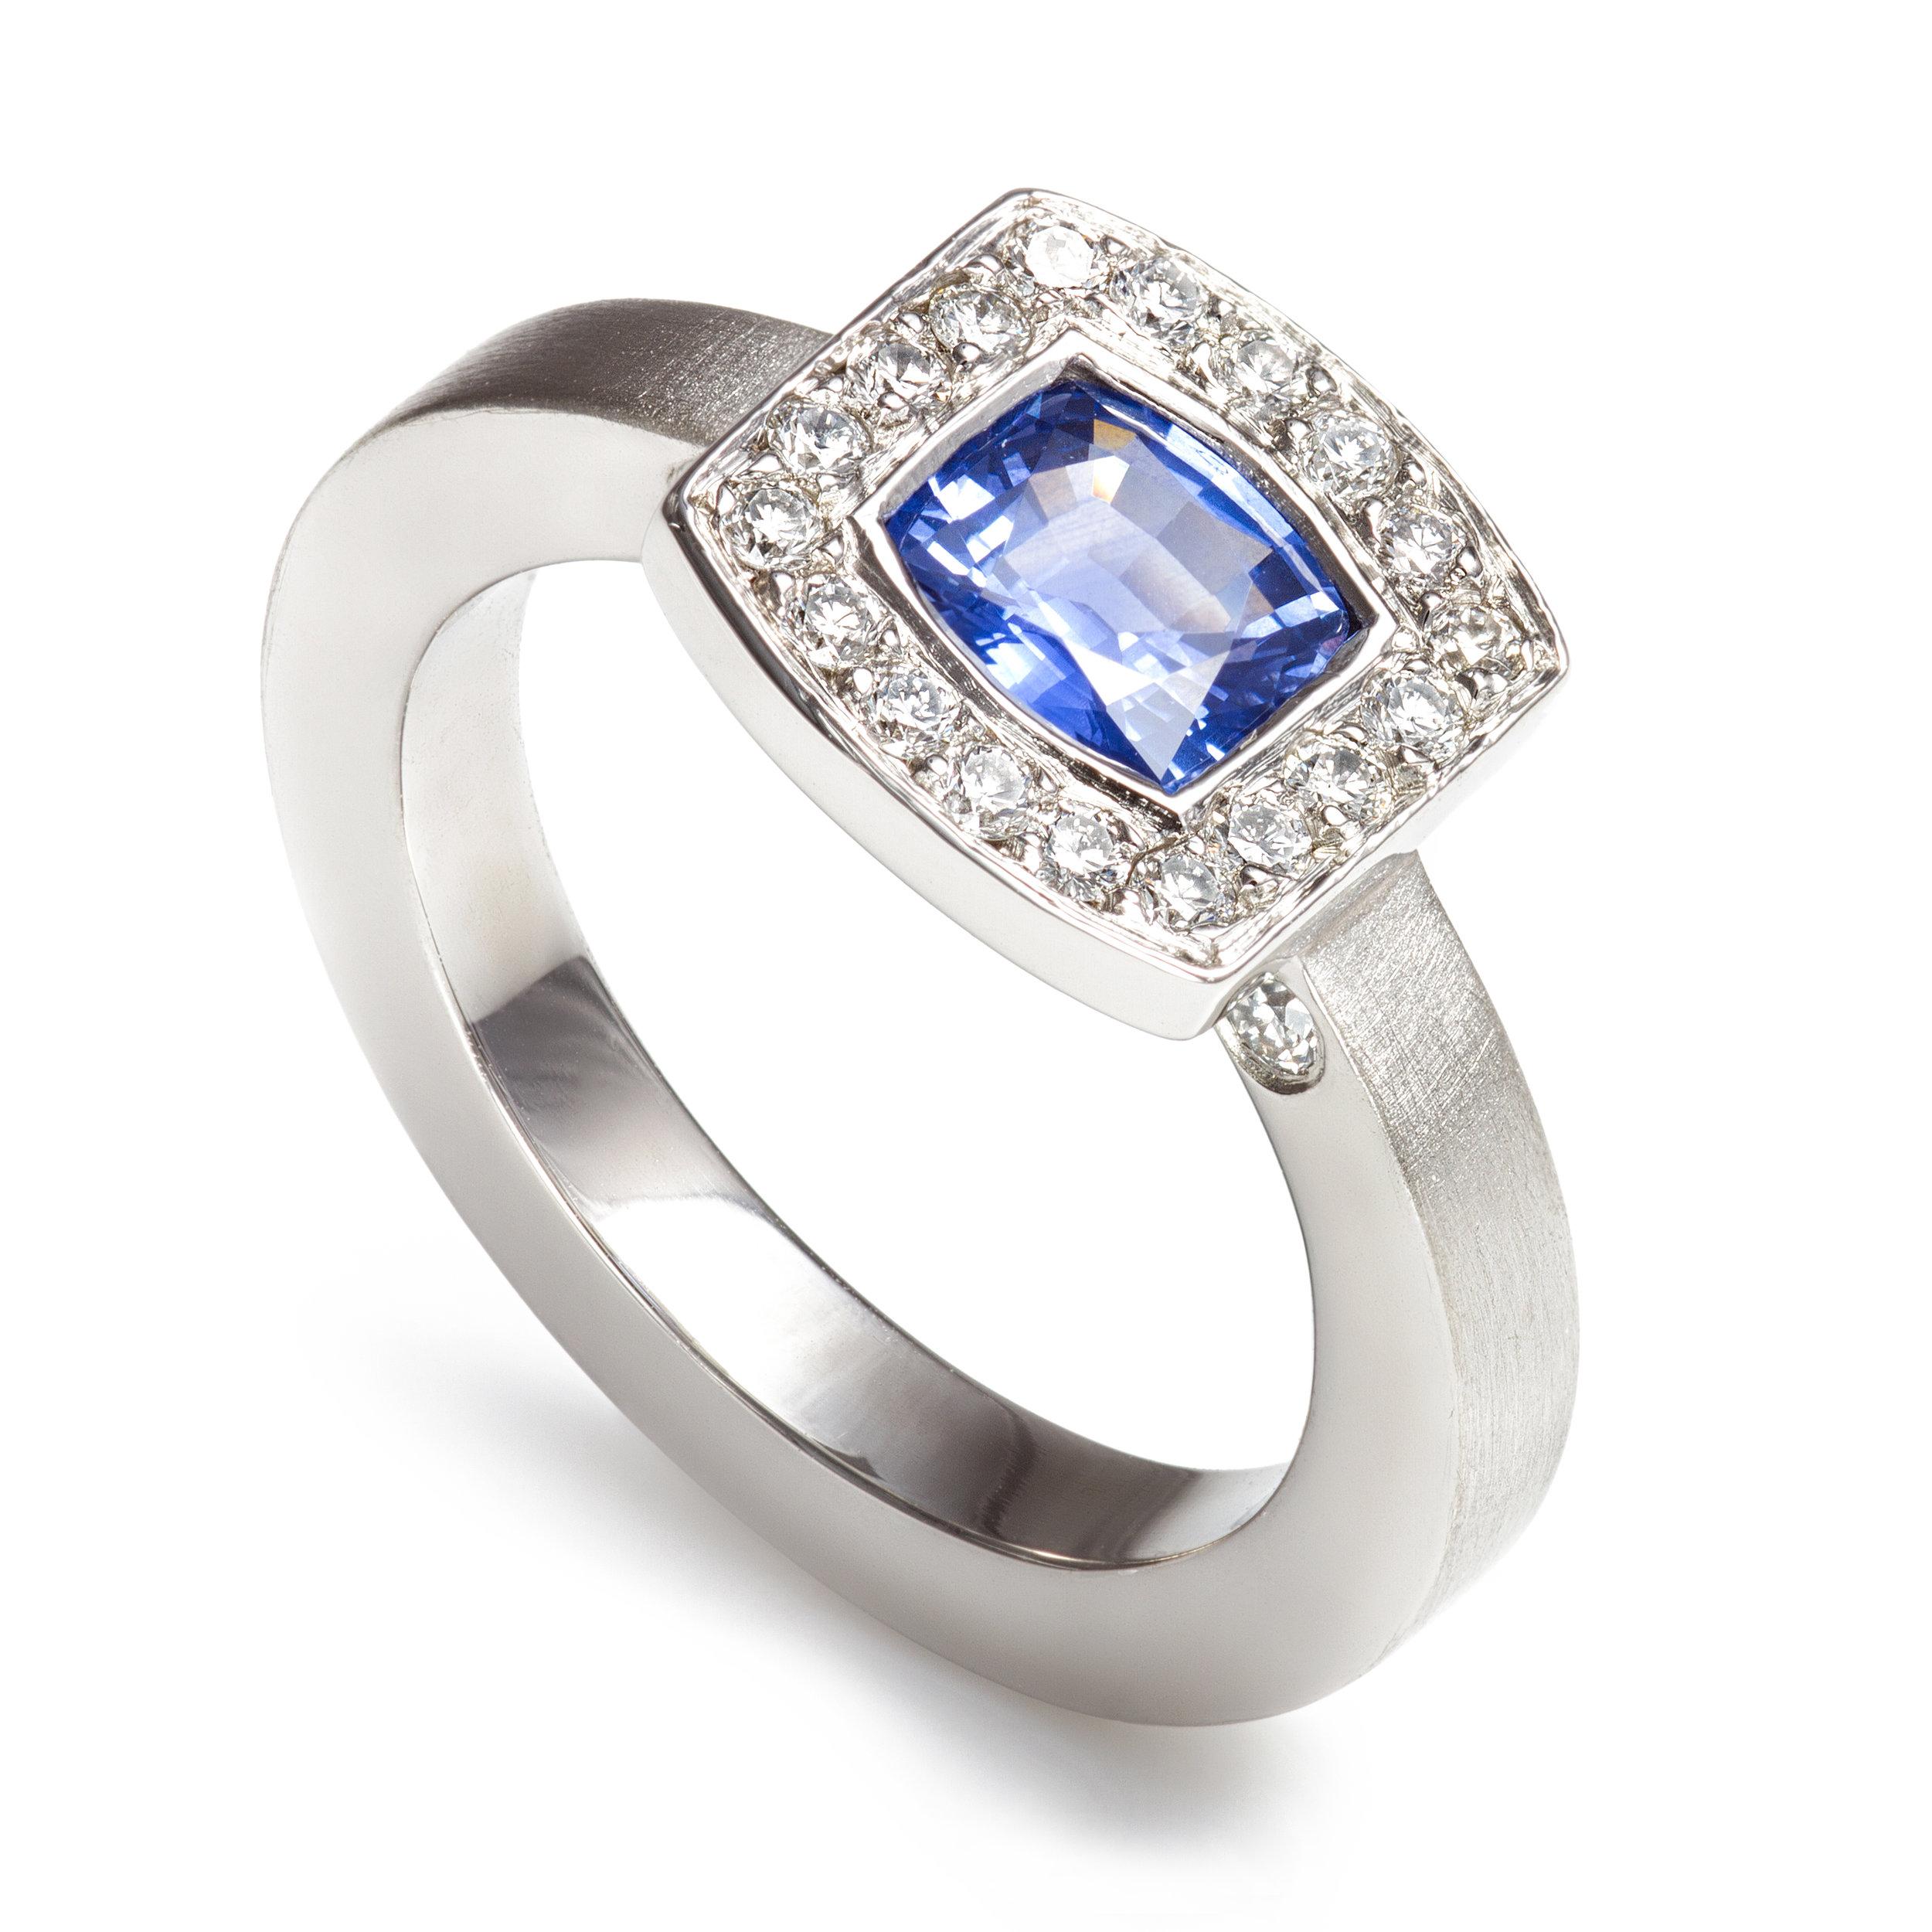 Bespoke platinum sapphire and diamond dress ring commission